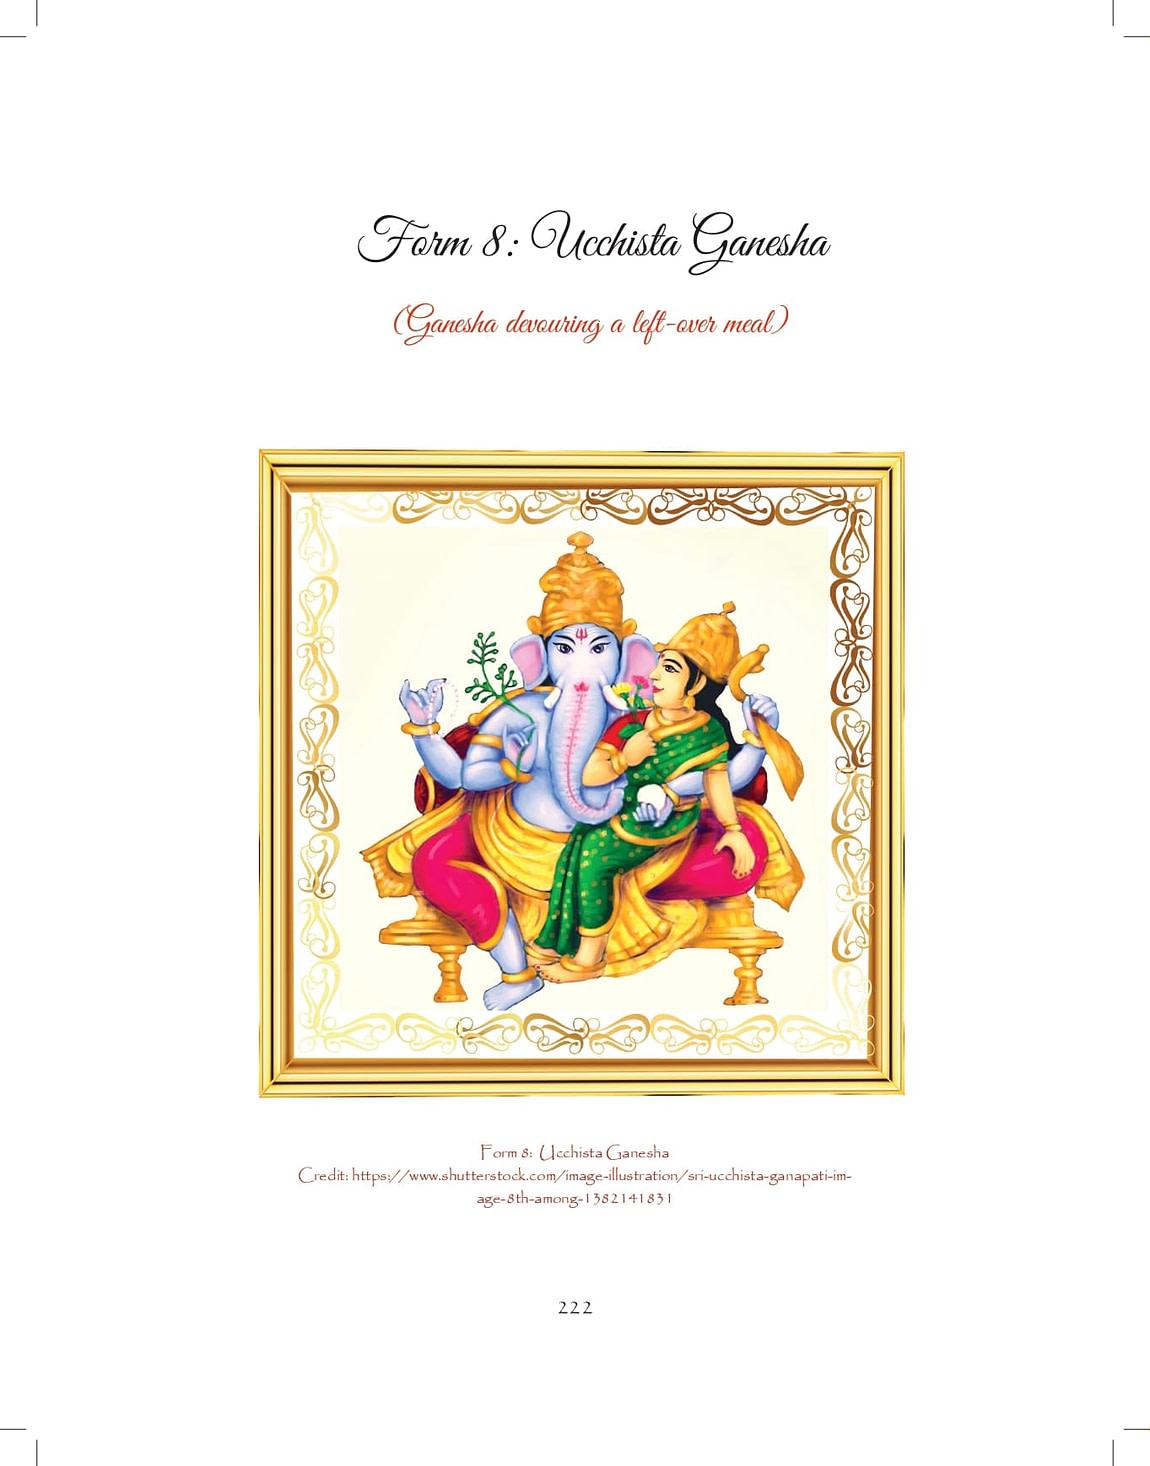 Ganesh-print_pages-to-jpg-0222.jpg